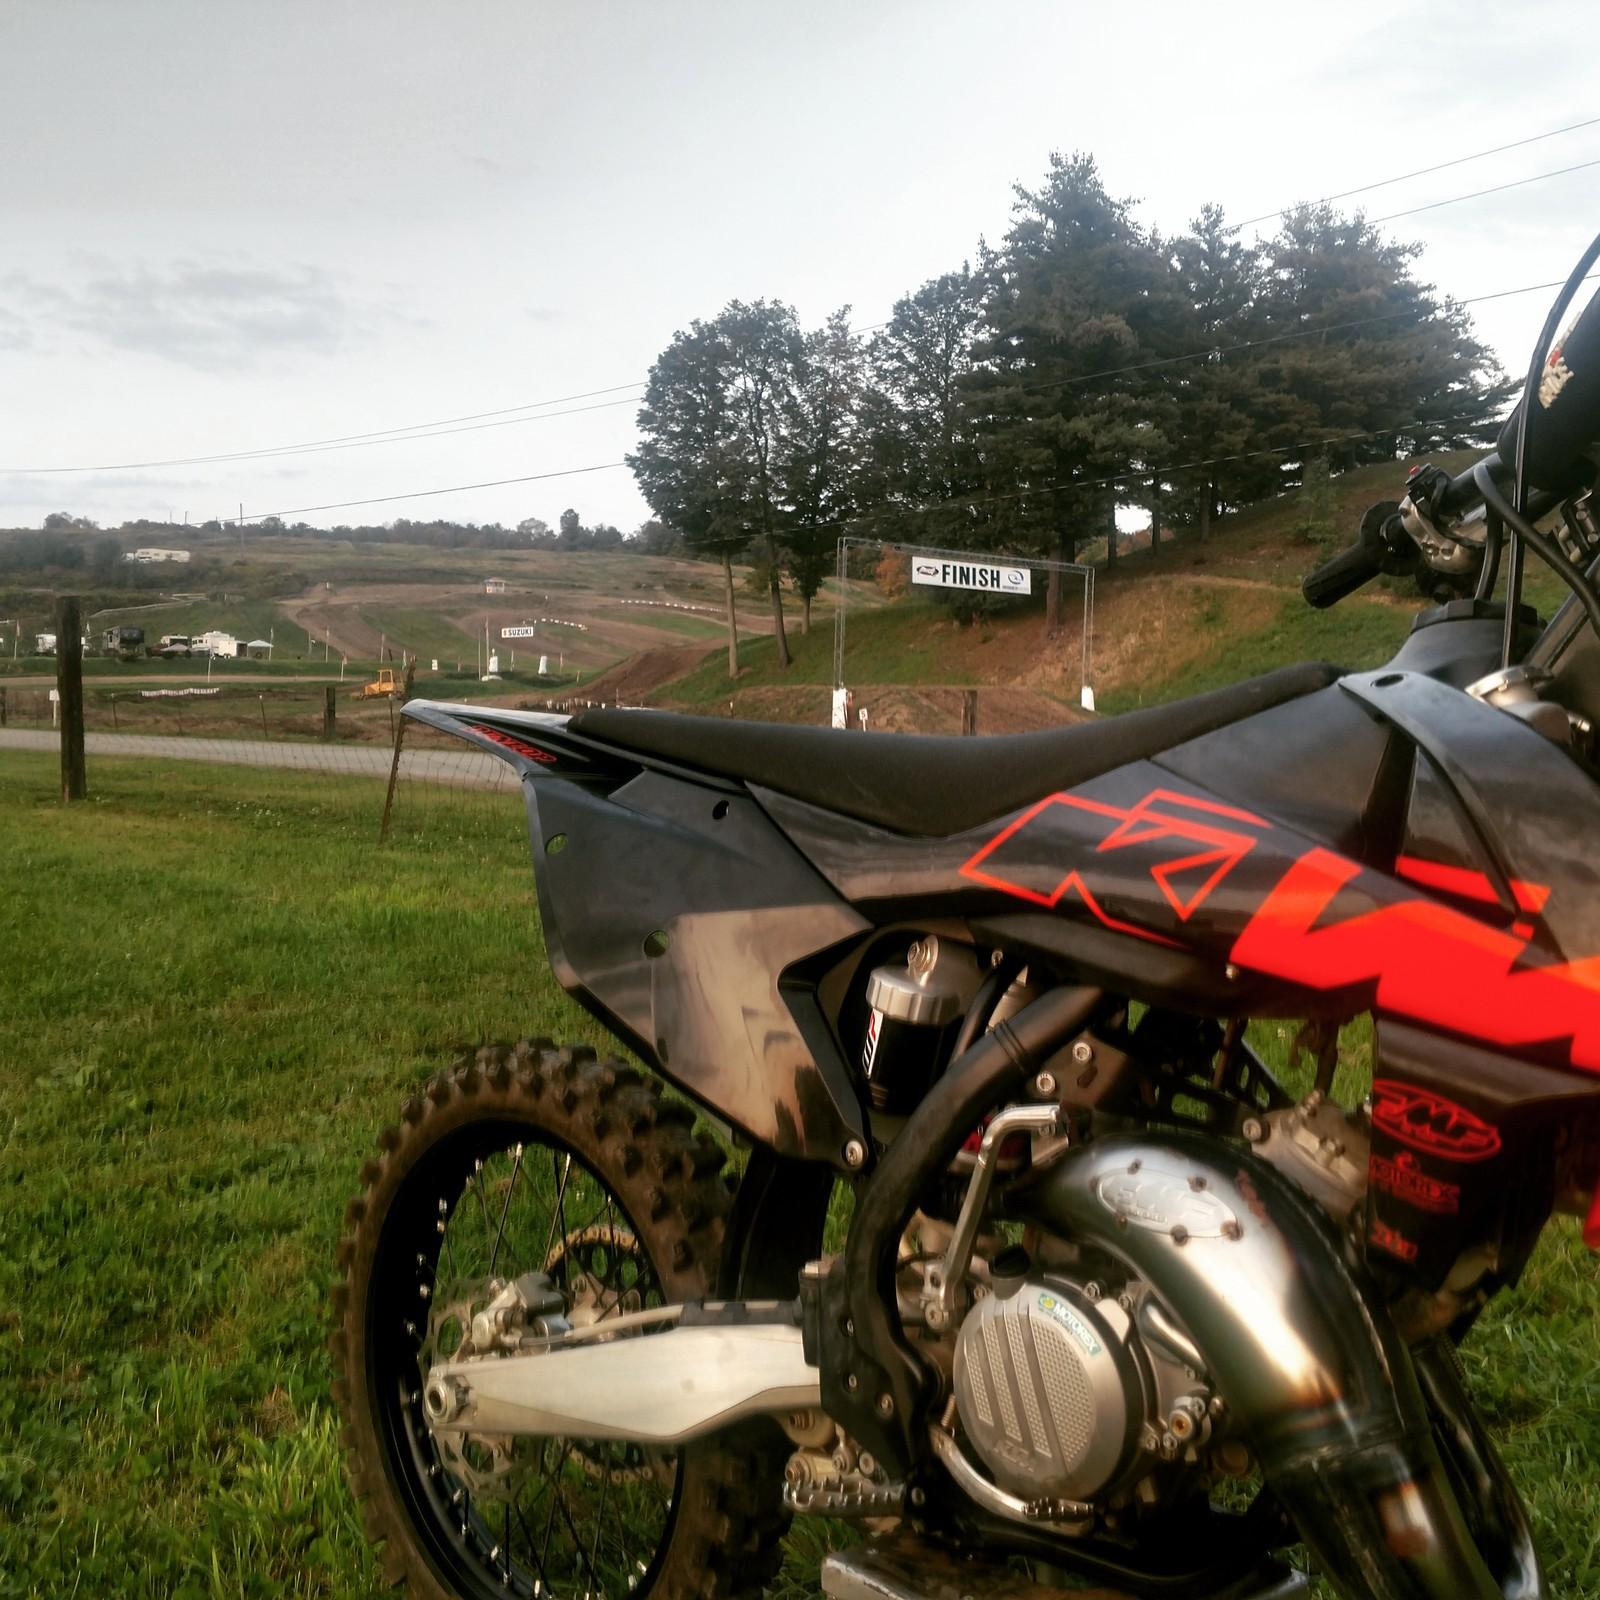 Broome Tioga - Harbison_916 - Motocross Pictures - Vital MX